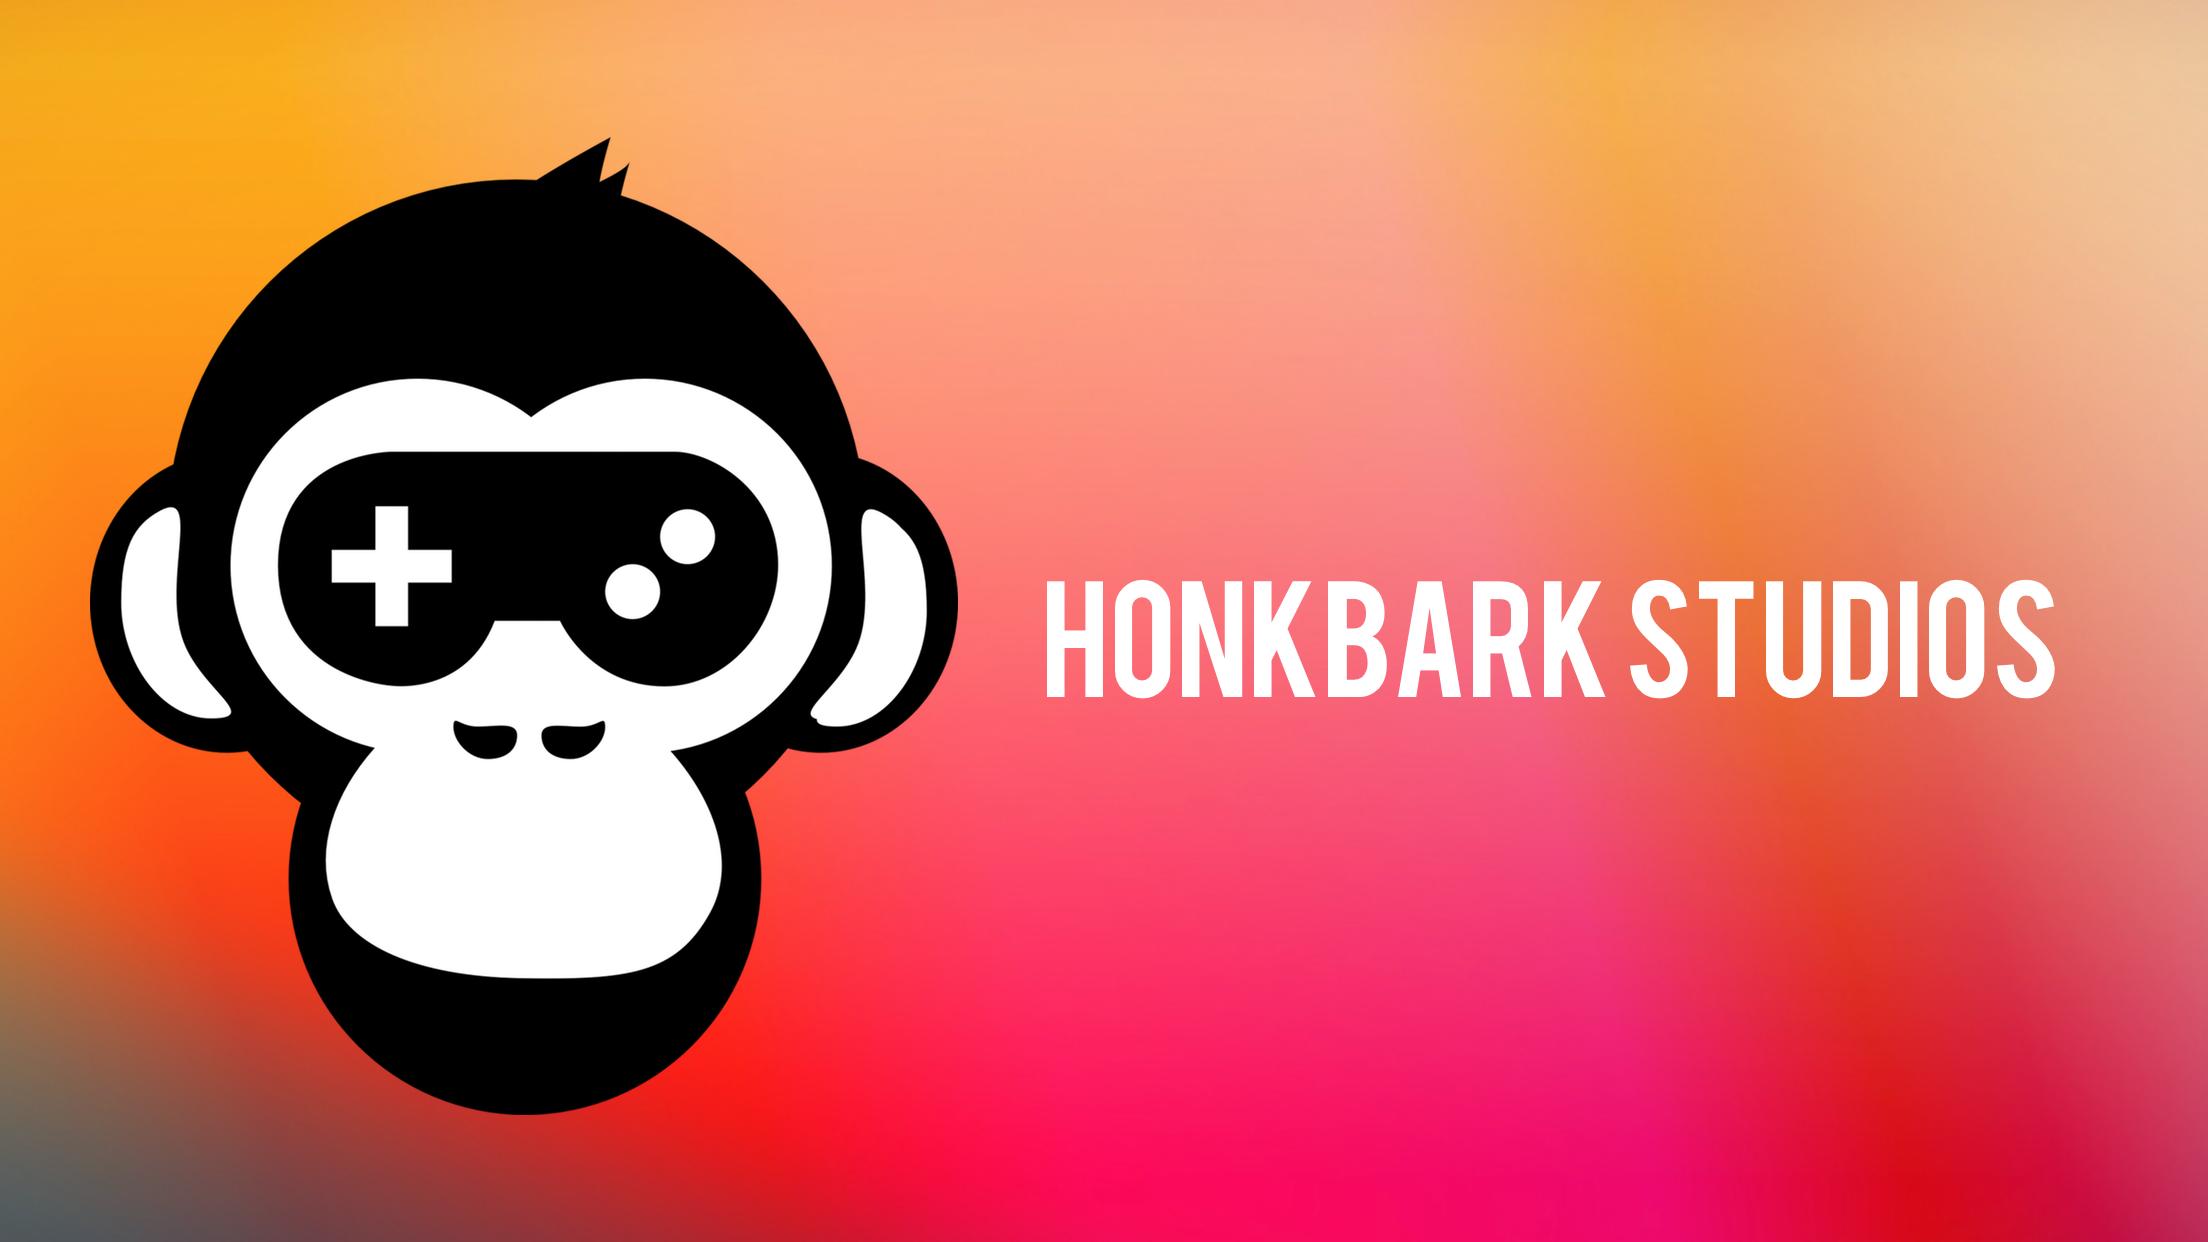 Honkbark Studios logo landscape